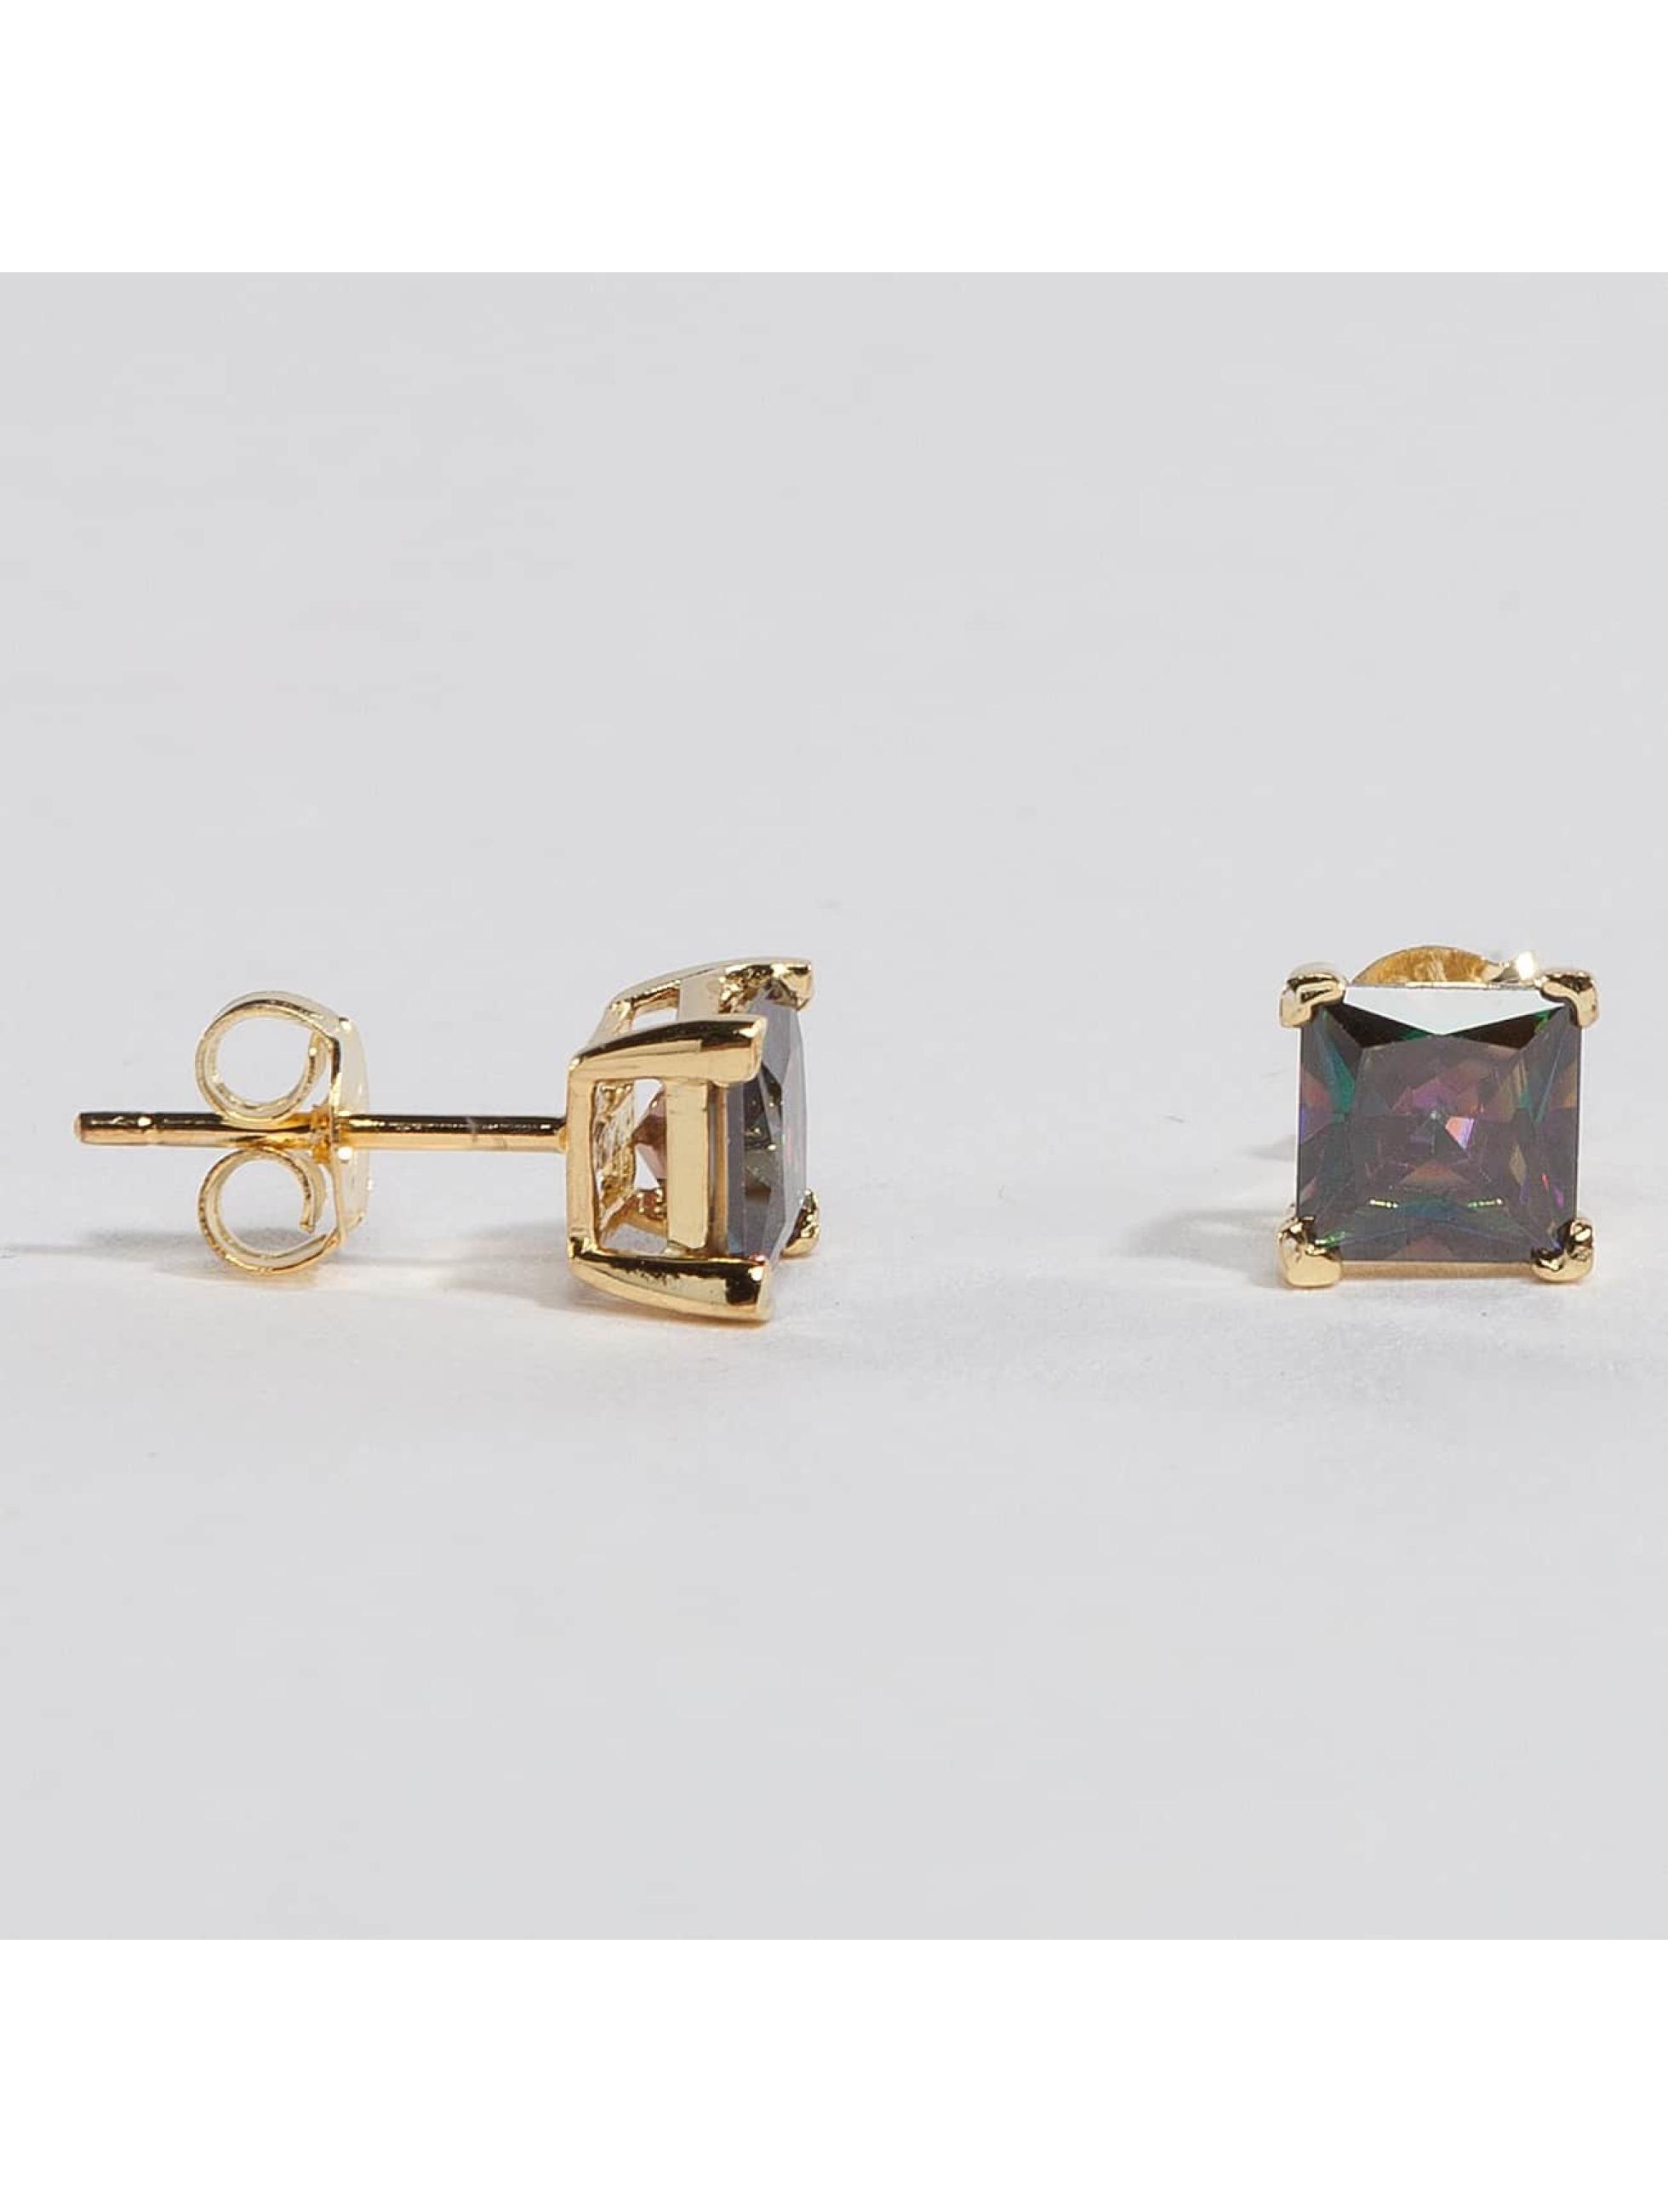 KING ICE Männer,Frauen Ohrringe Gold_Plated 6mm 925 Sterling_Silver CZ Princess Cut in goldfarben